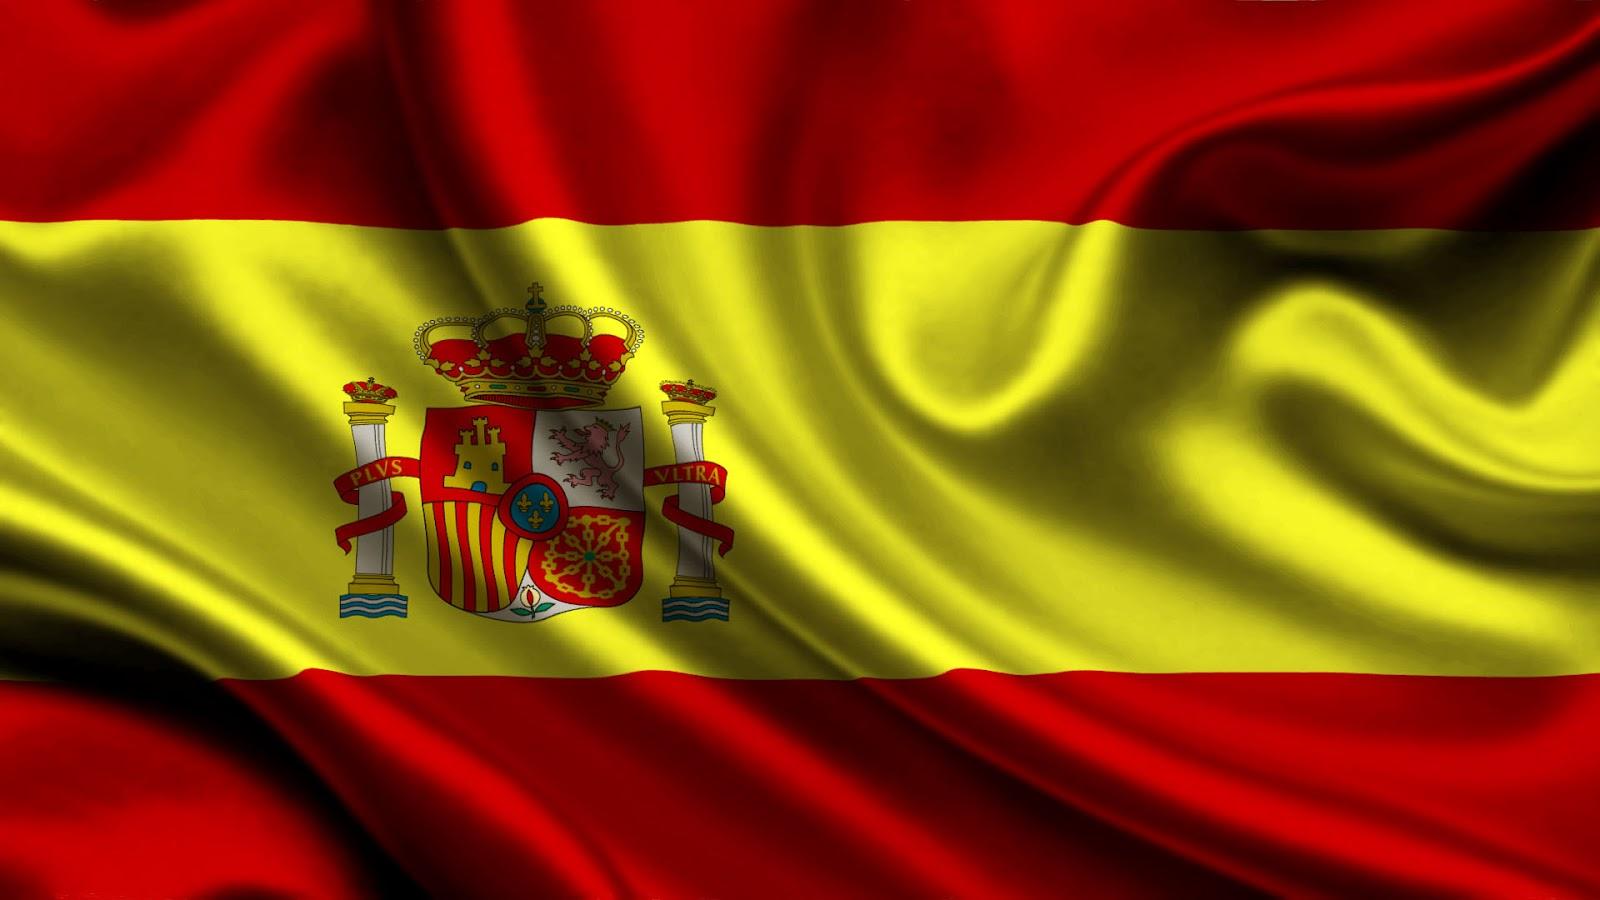 Gambar Bendera Spanyol Keren Keren  Kumpulan Gambar